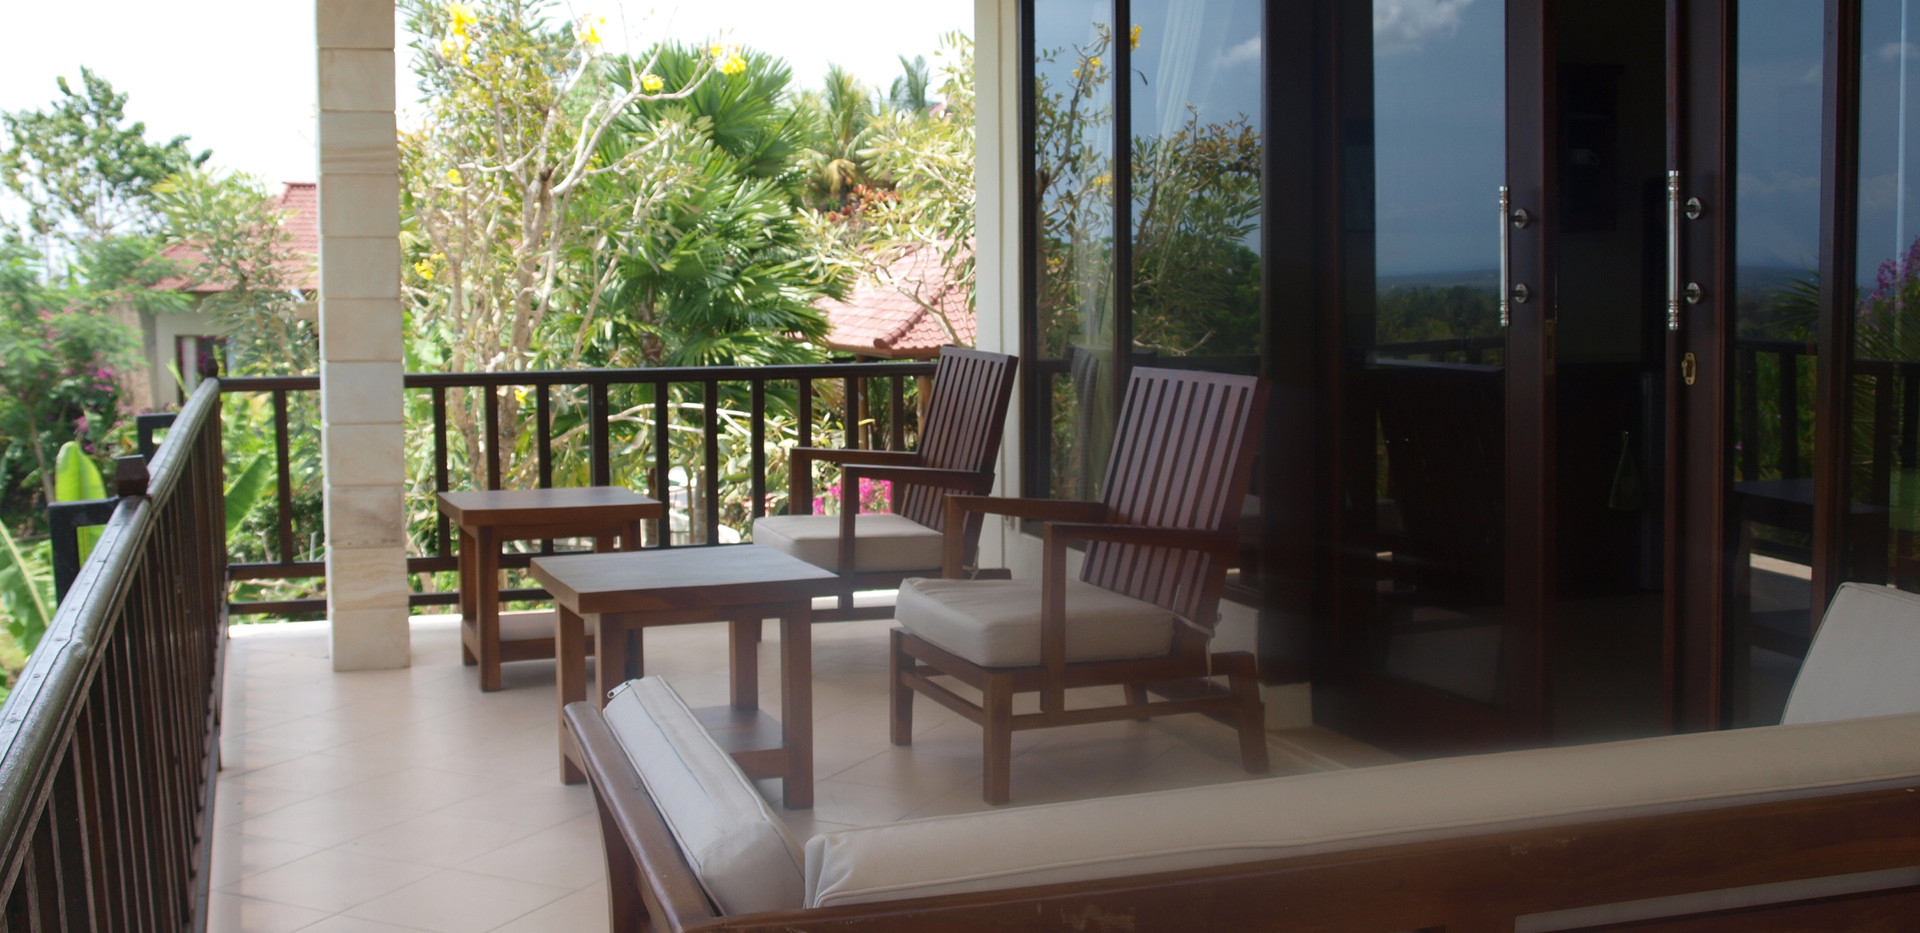 Capung upstairs balcony